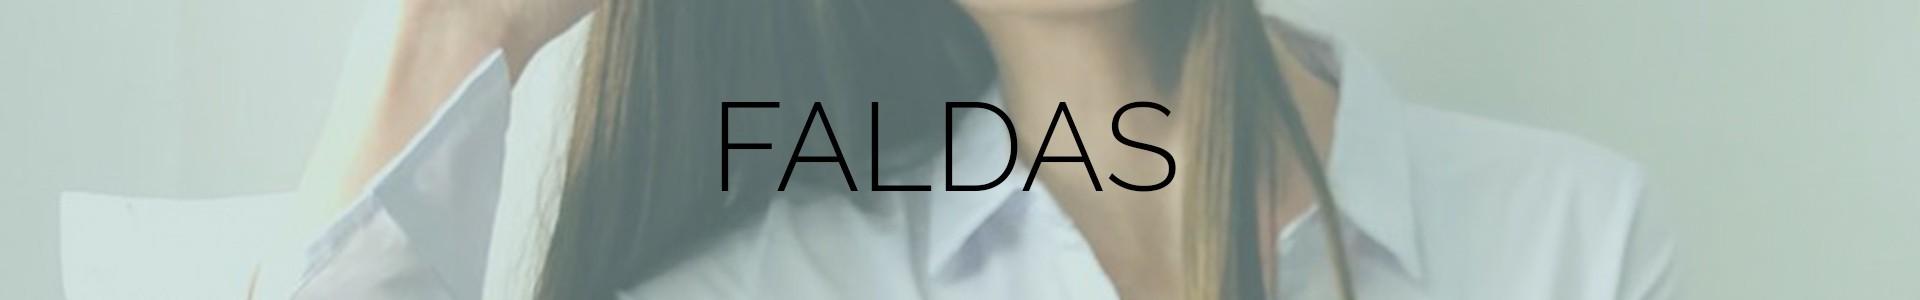 Faldas de mujer. Lima Limon Tienda online de moda